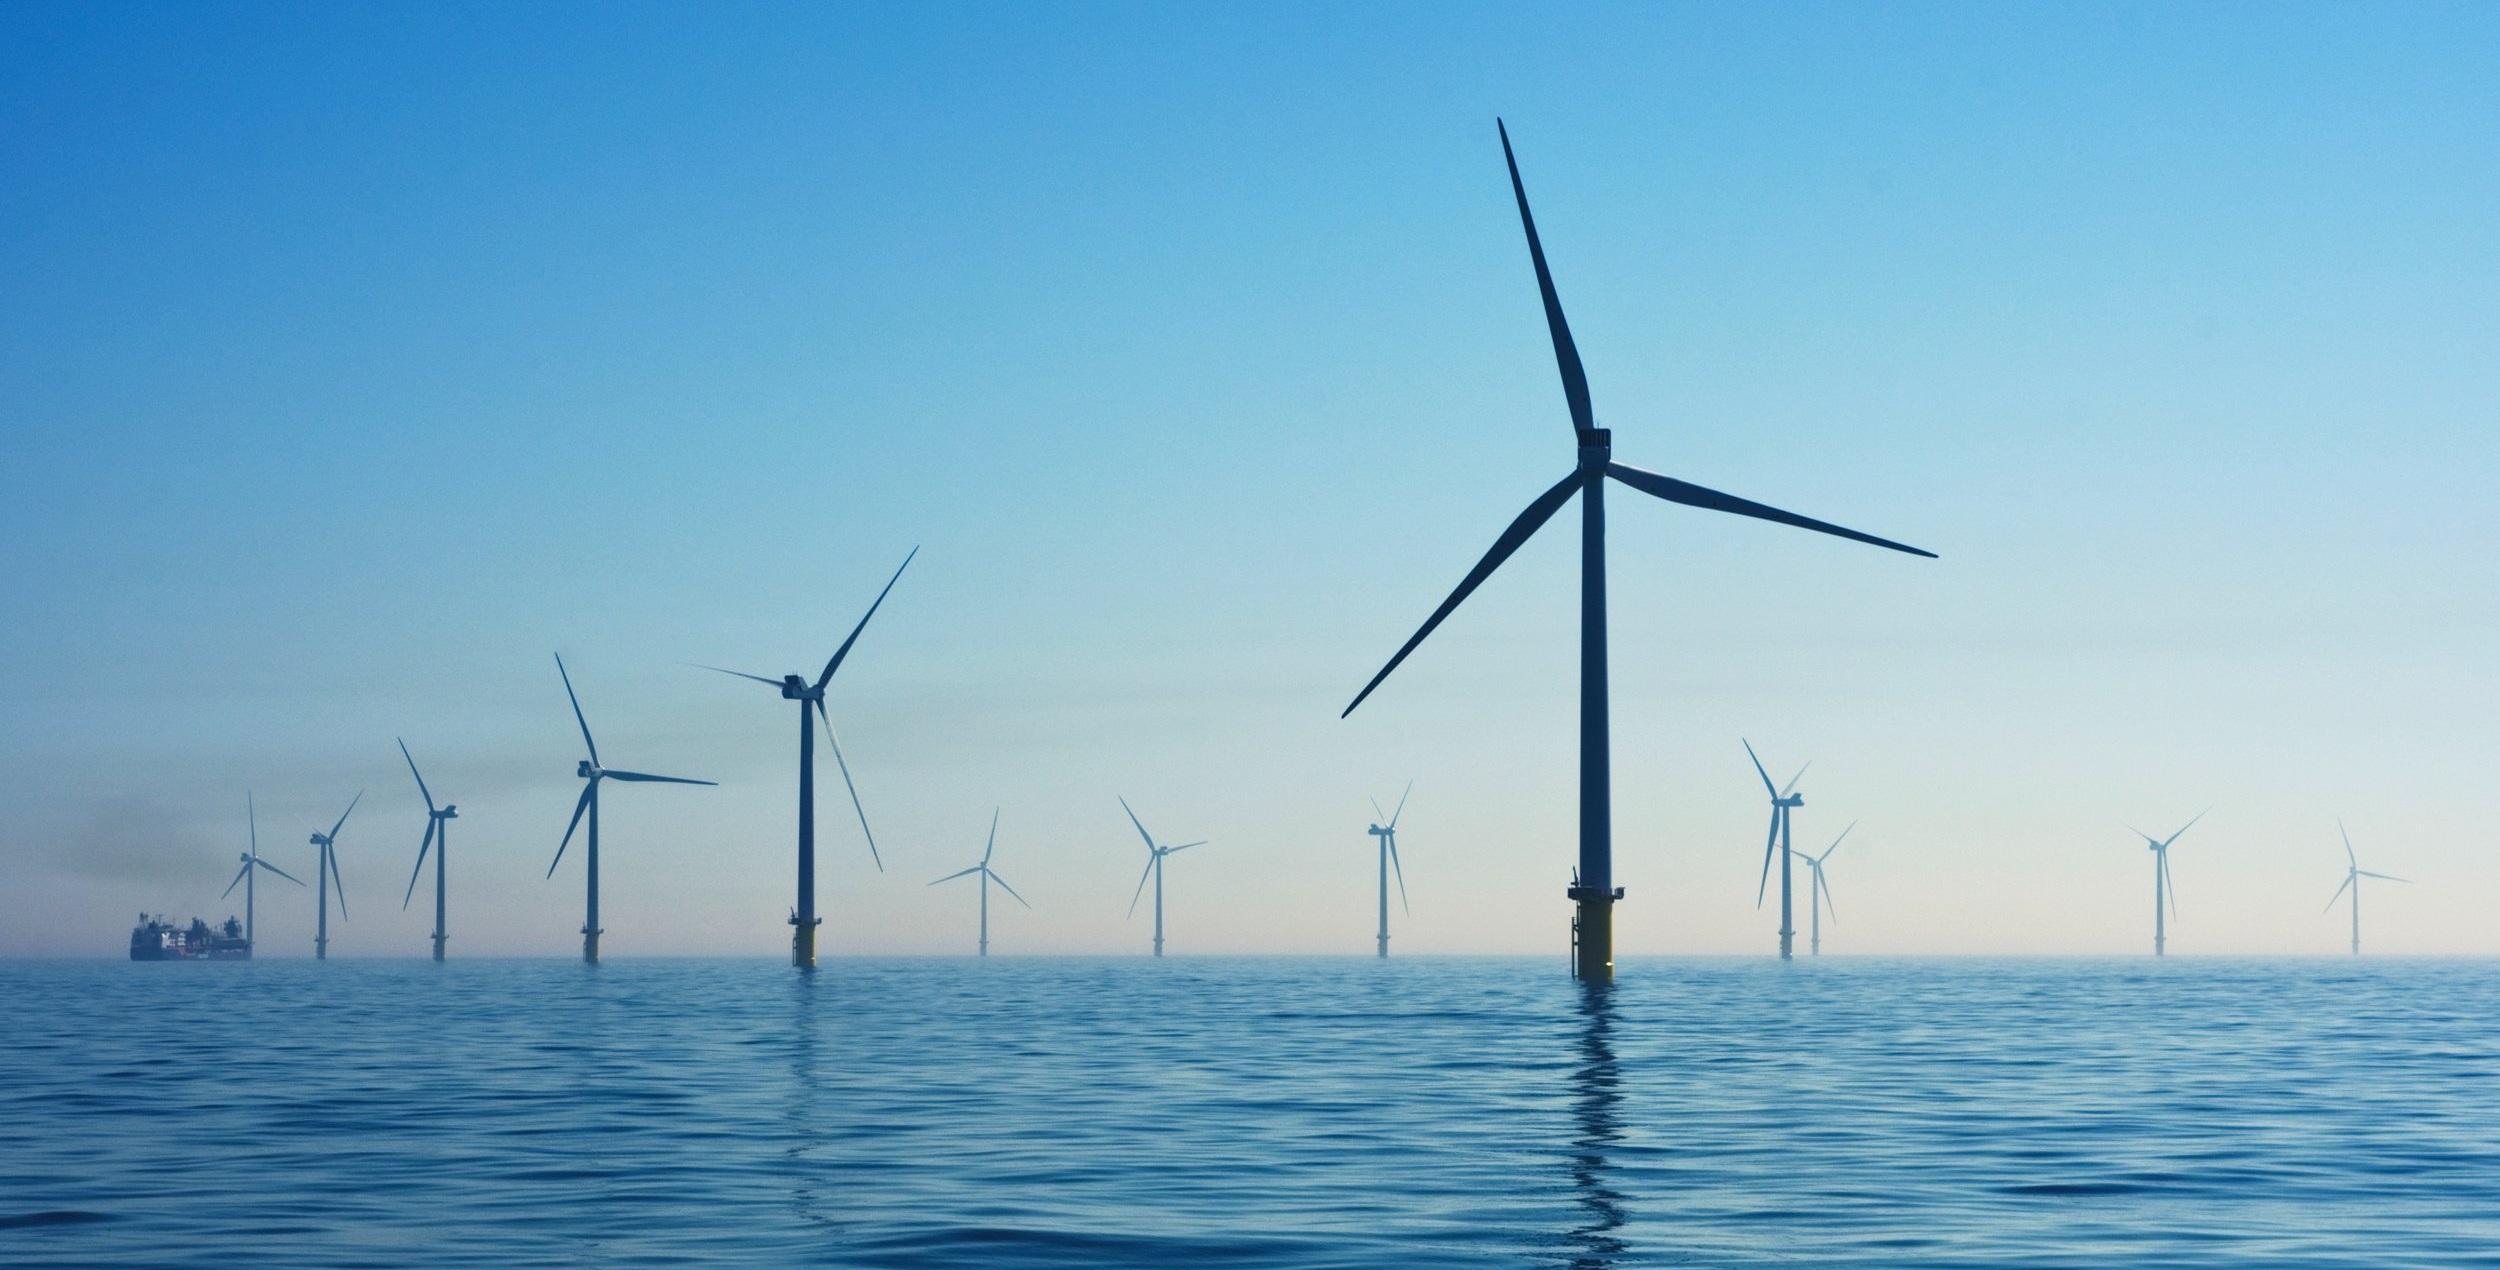 Rampion Offshore Wind Farm, United Kingdom. Photo by    Nicholas Doherty    on    Unsplash   .